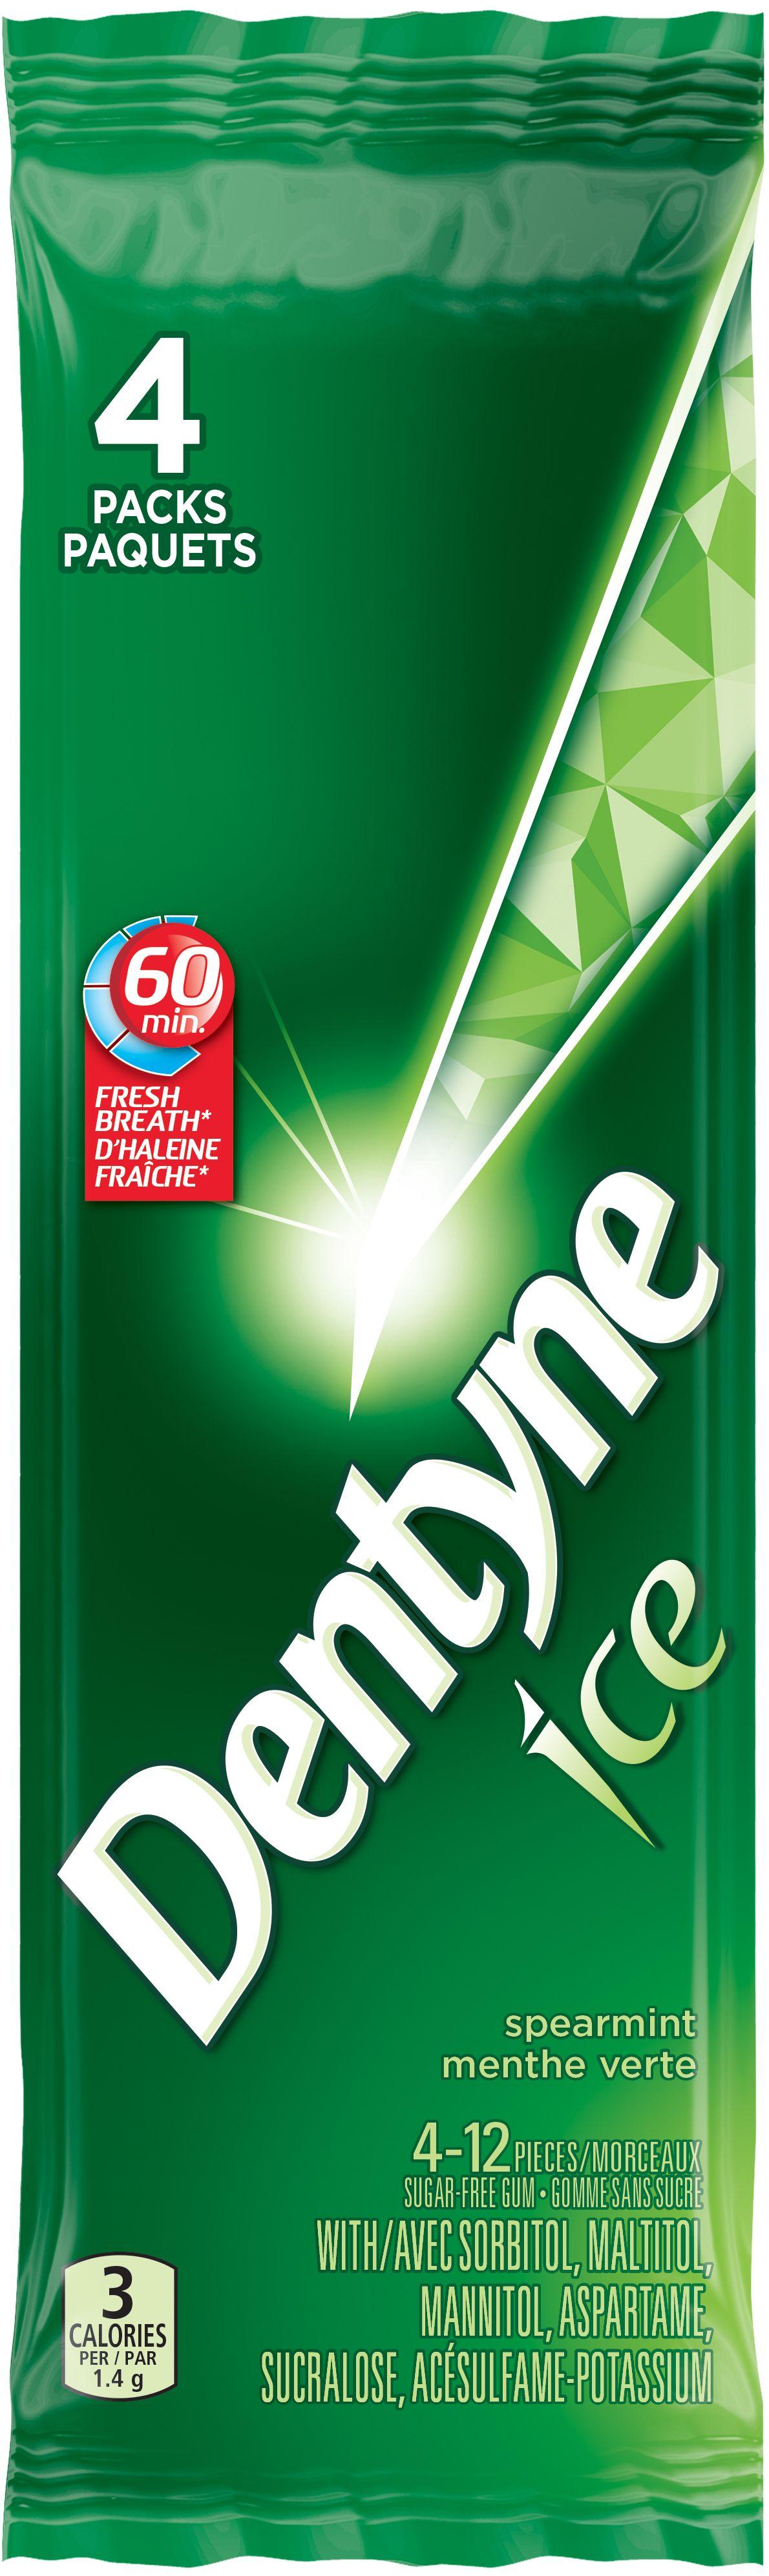 Dentyne Ice Spearmint Gum 48 Count